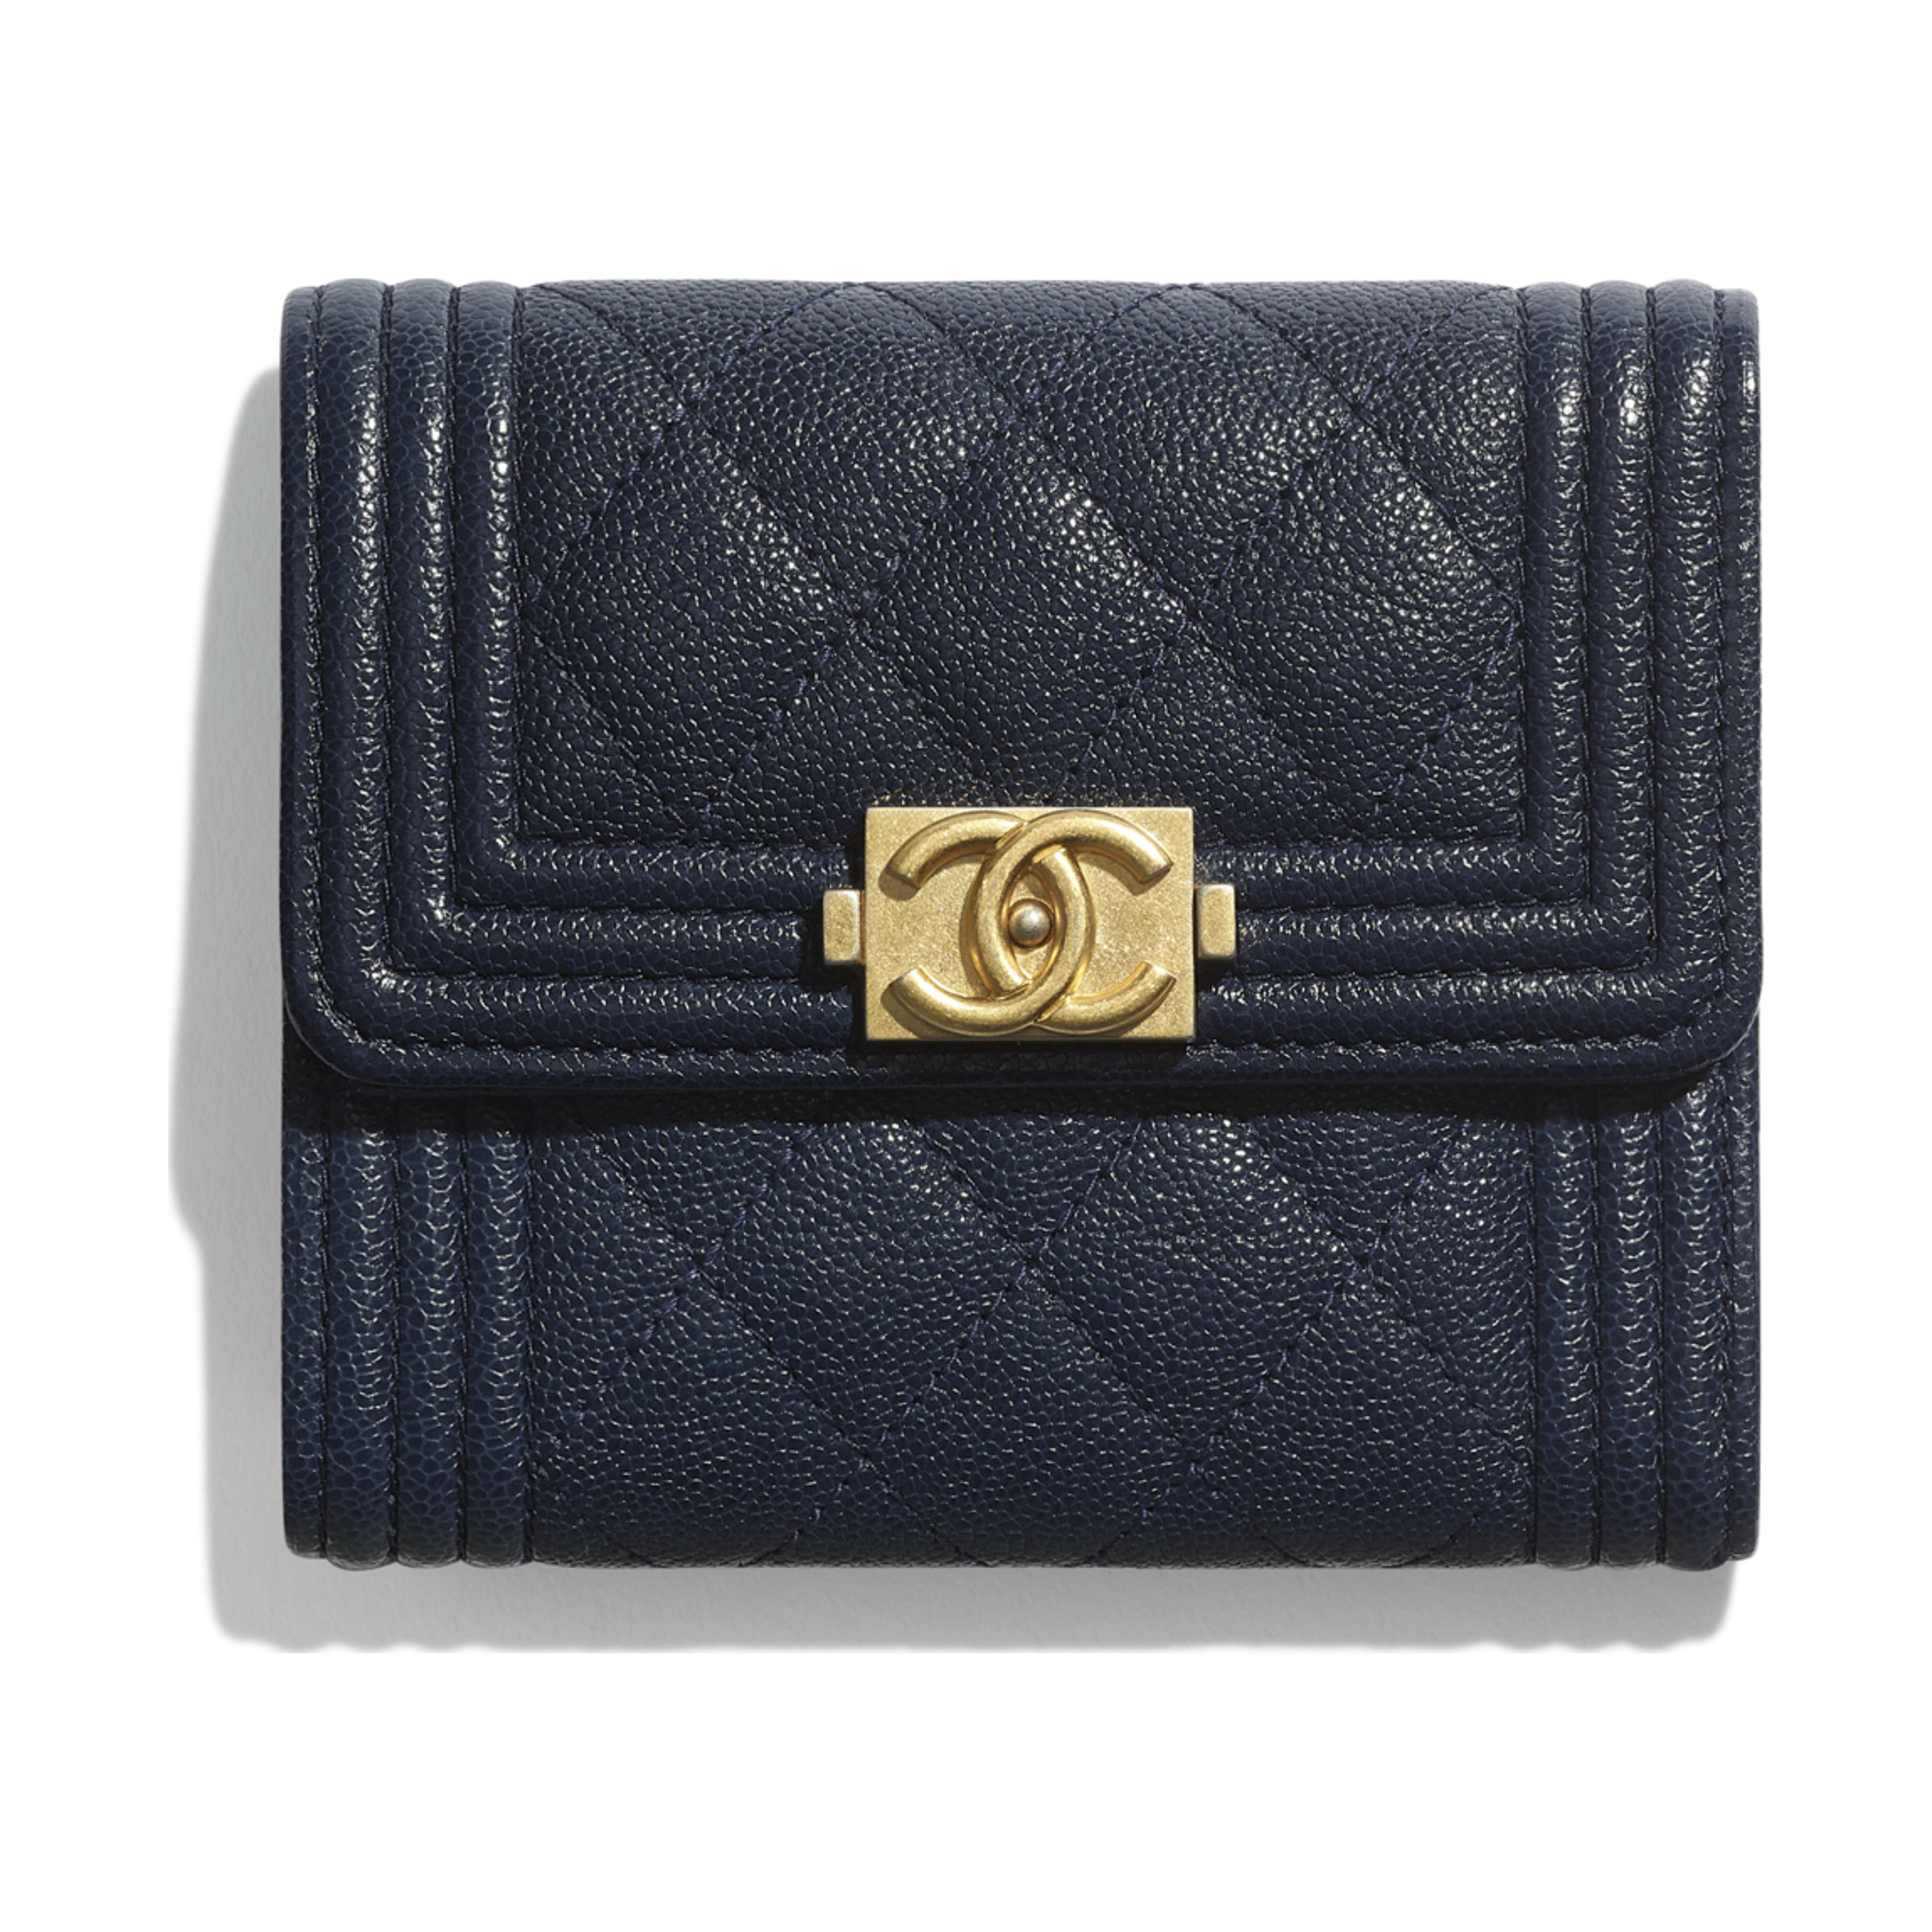 88745e54b9ca Grained Calfskin Gold Tone Metal Navy Blue Boy Chanel Small Flap